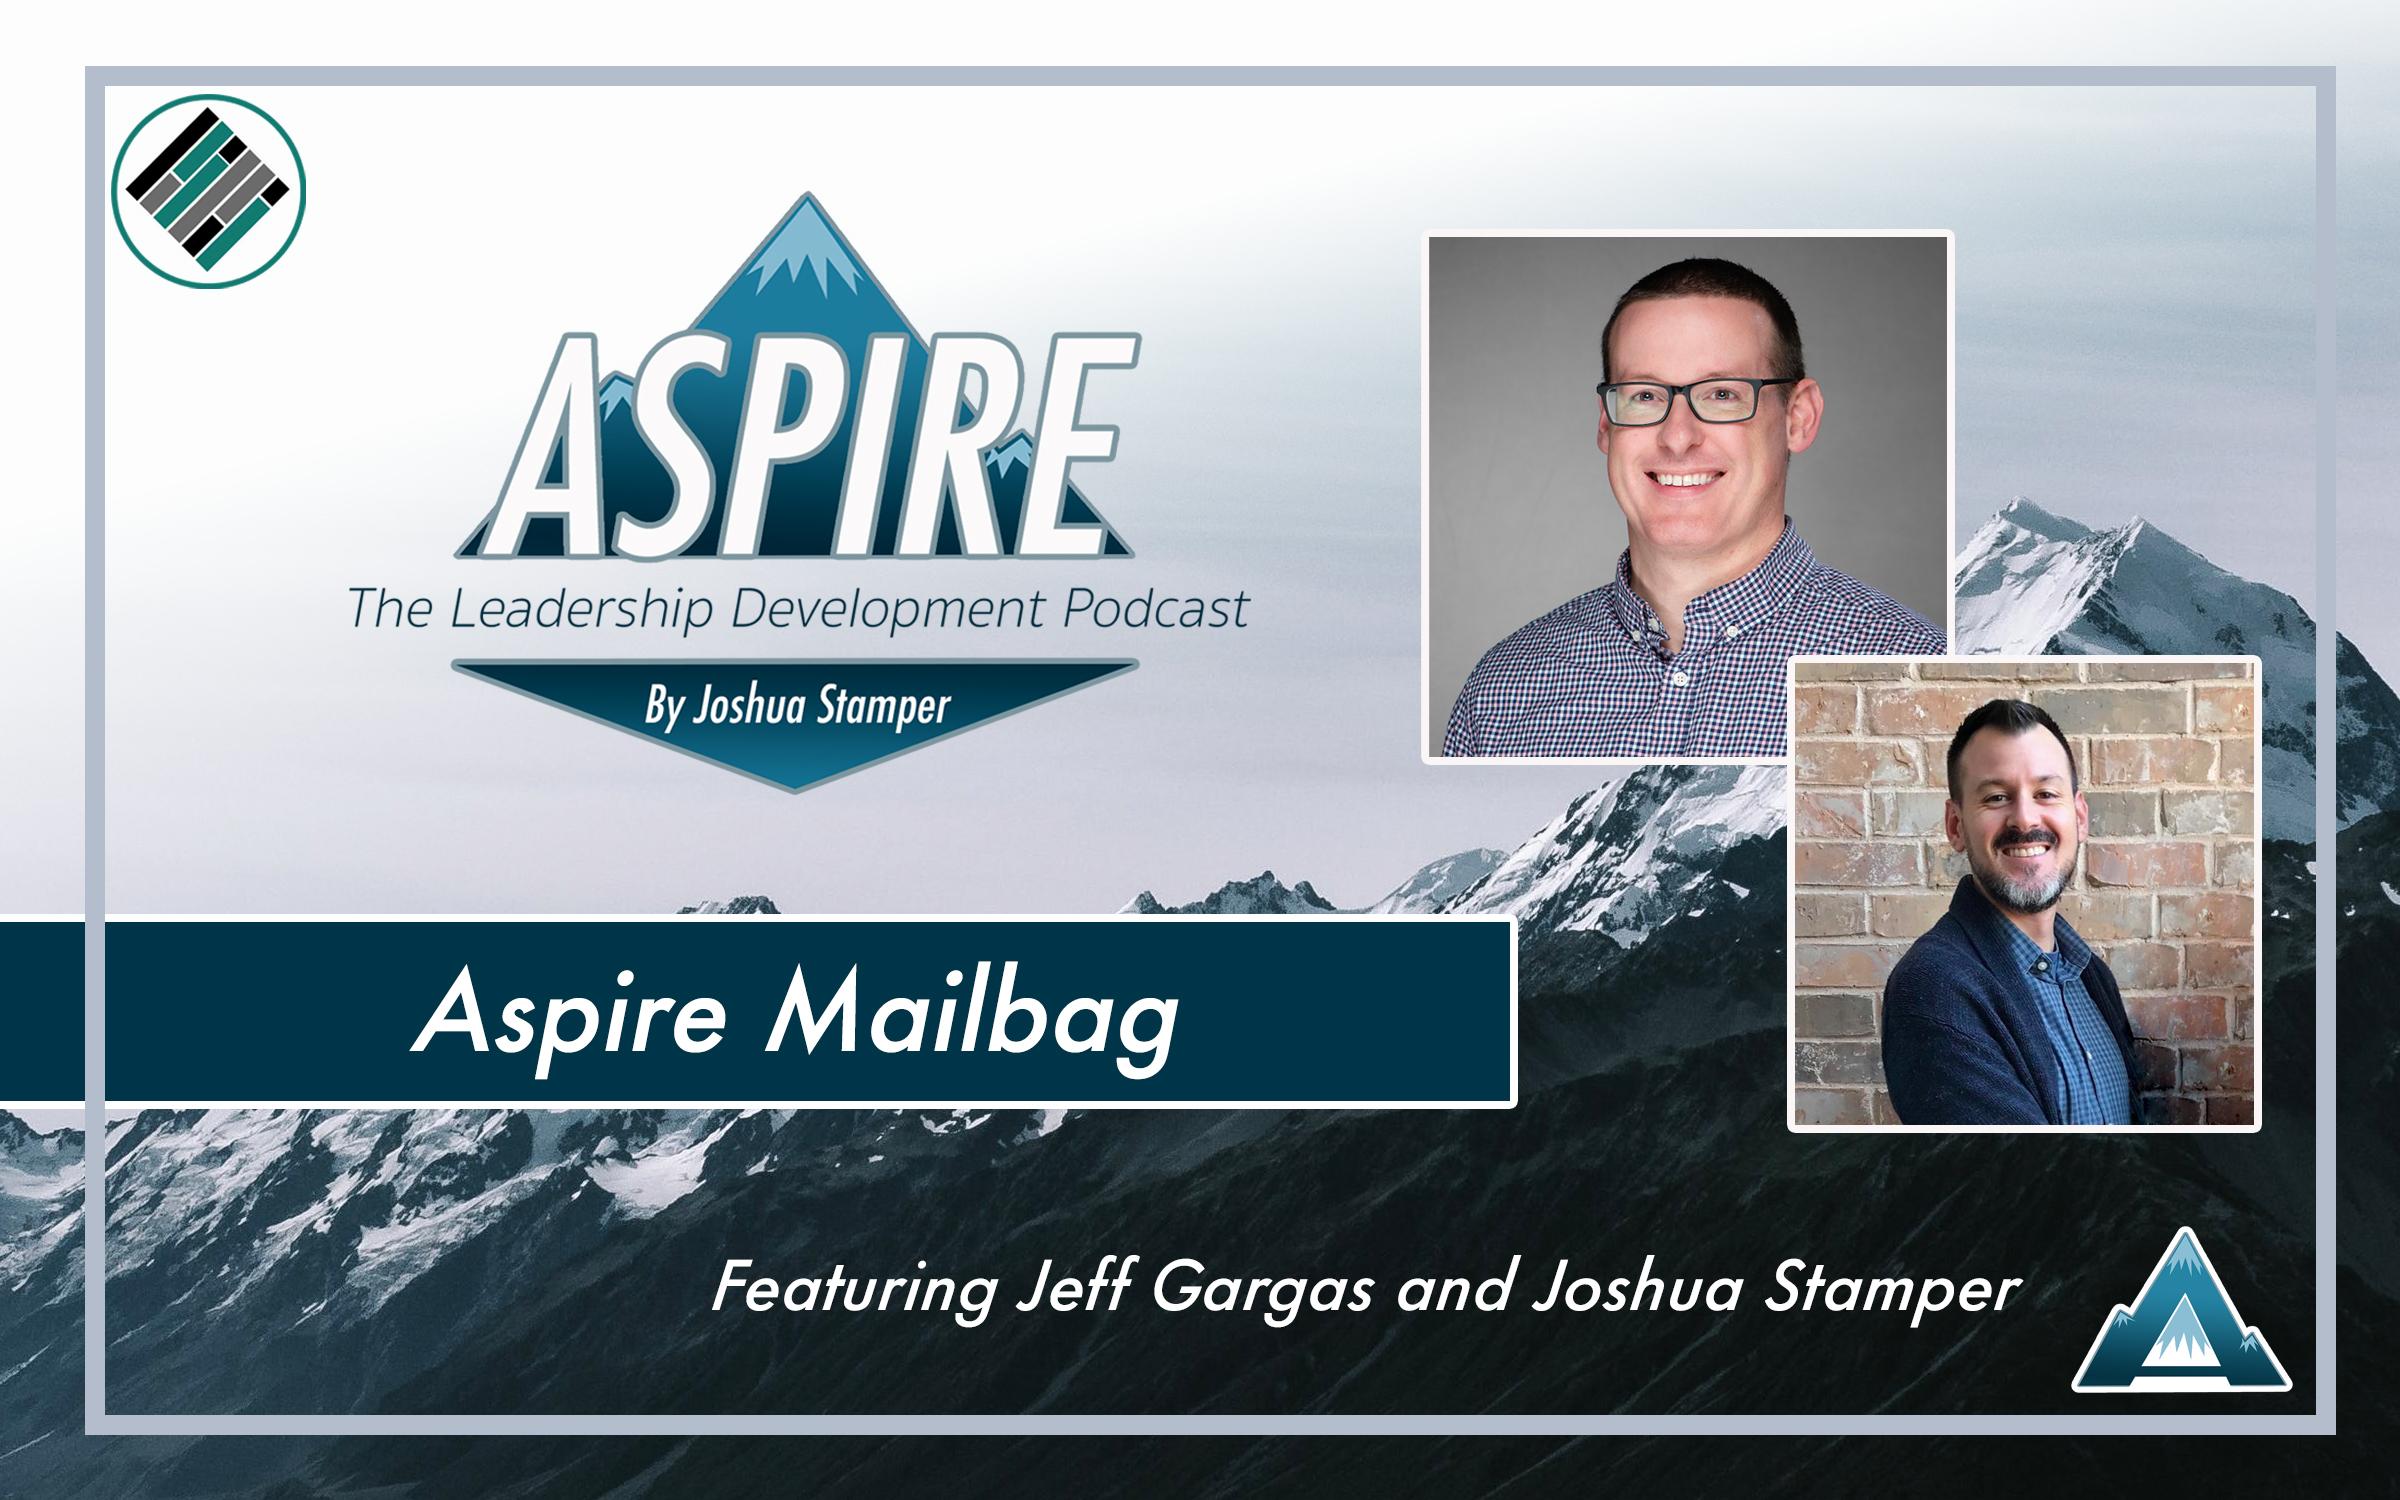 Aspire Mailbag, Joshua Stamper, Jeff Gargas, Aspire: The Leadership Development Podcast